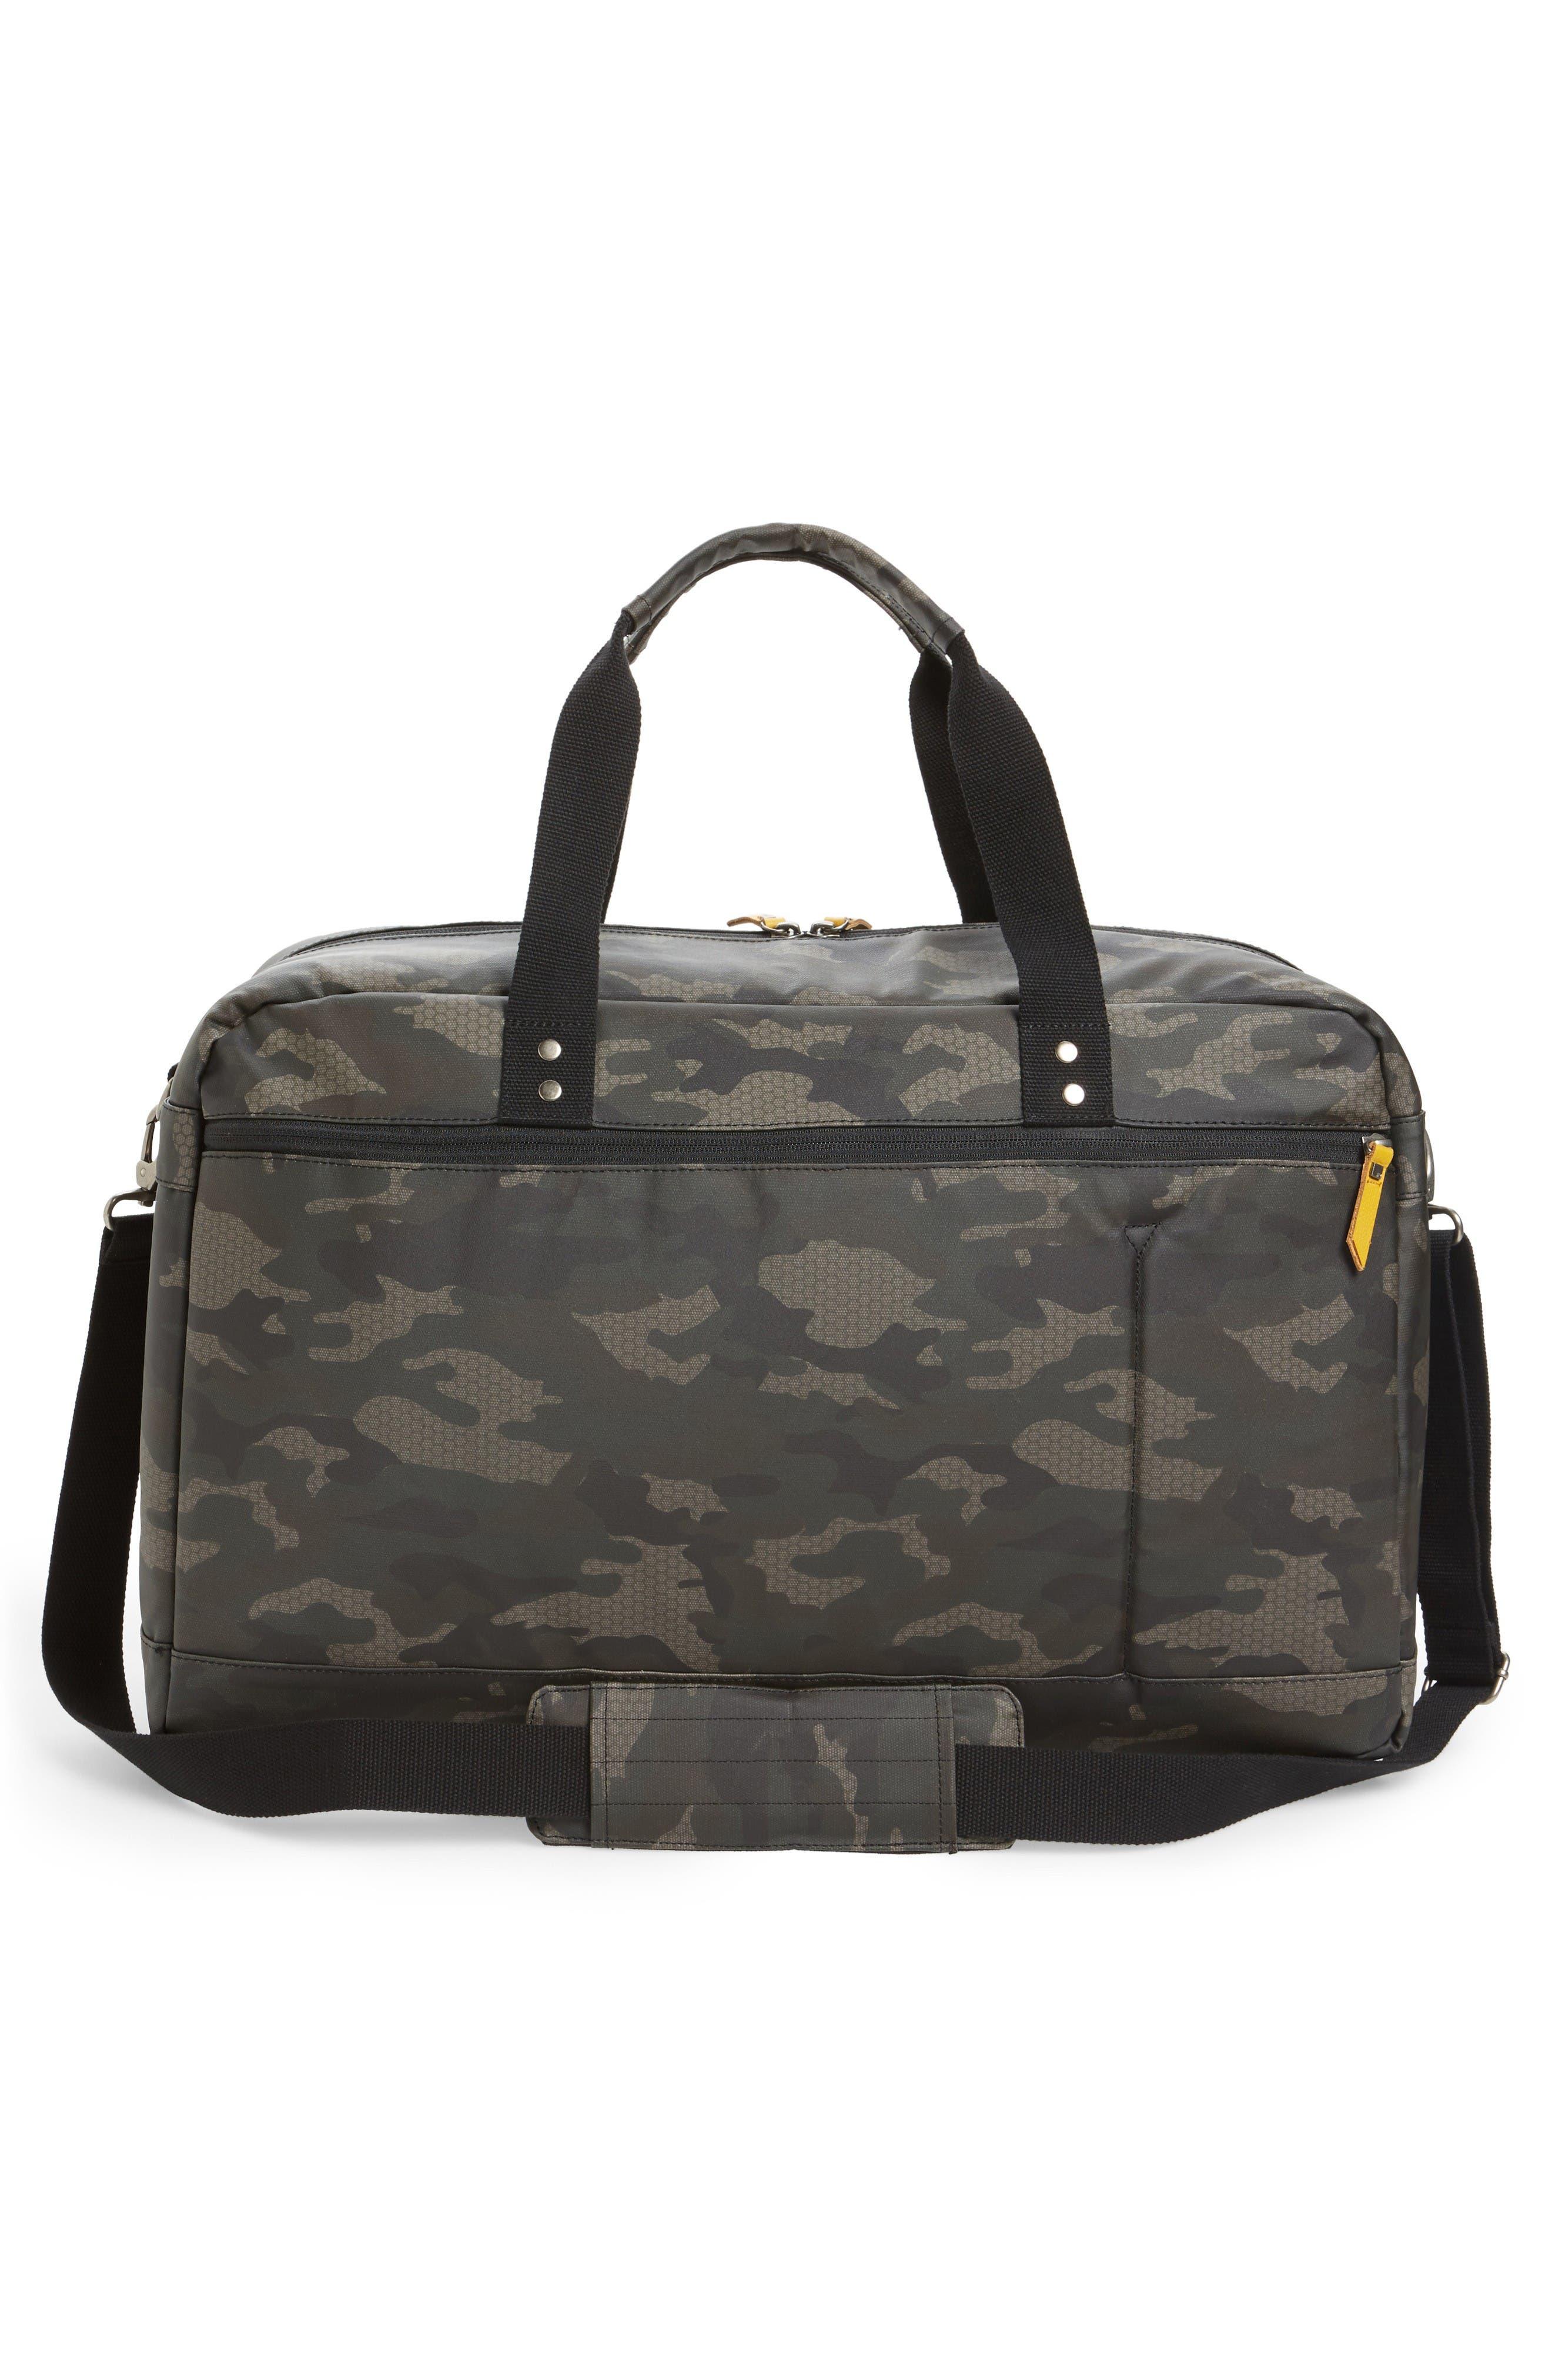 Calibre Duffel Bag,                             Alternate thumbnail 3, color,                             Camo